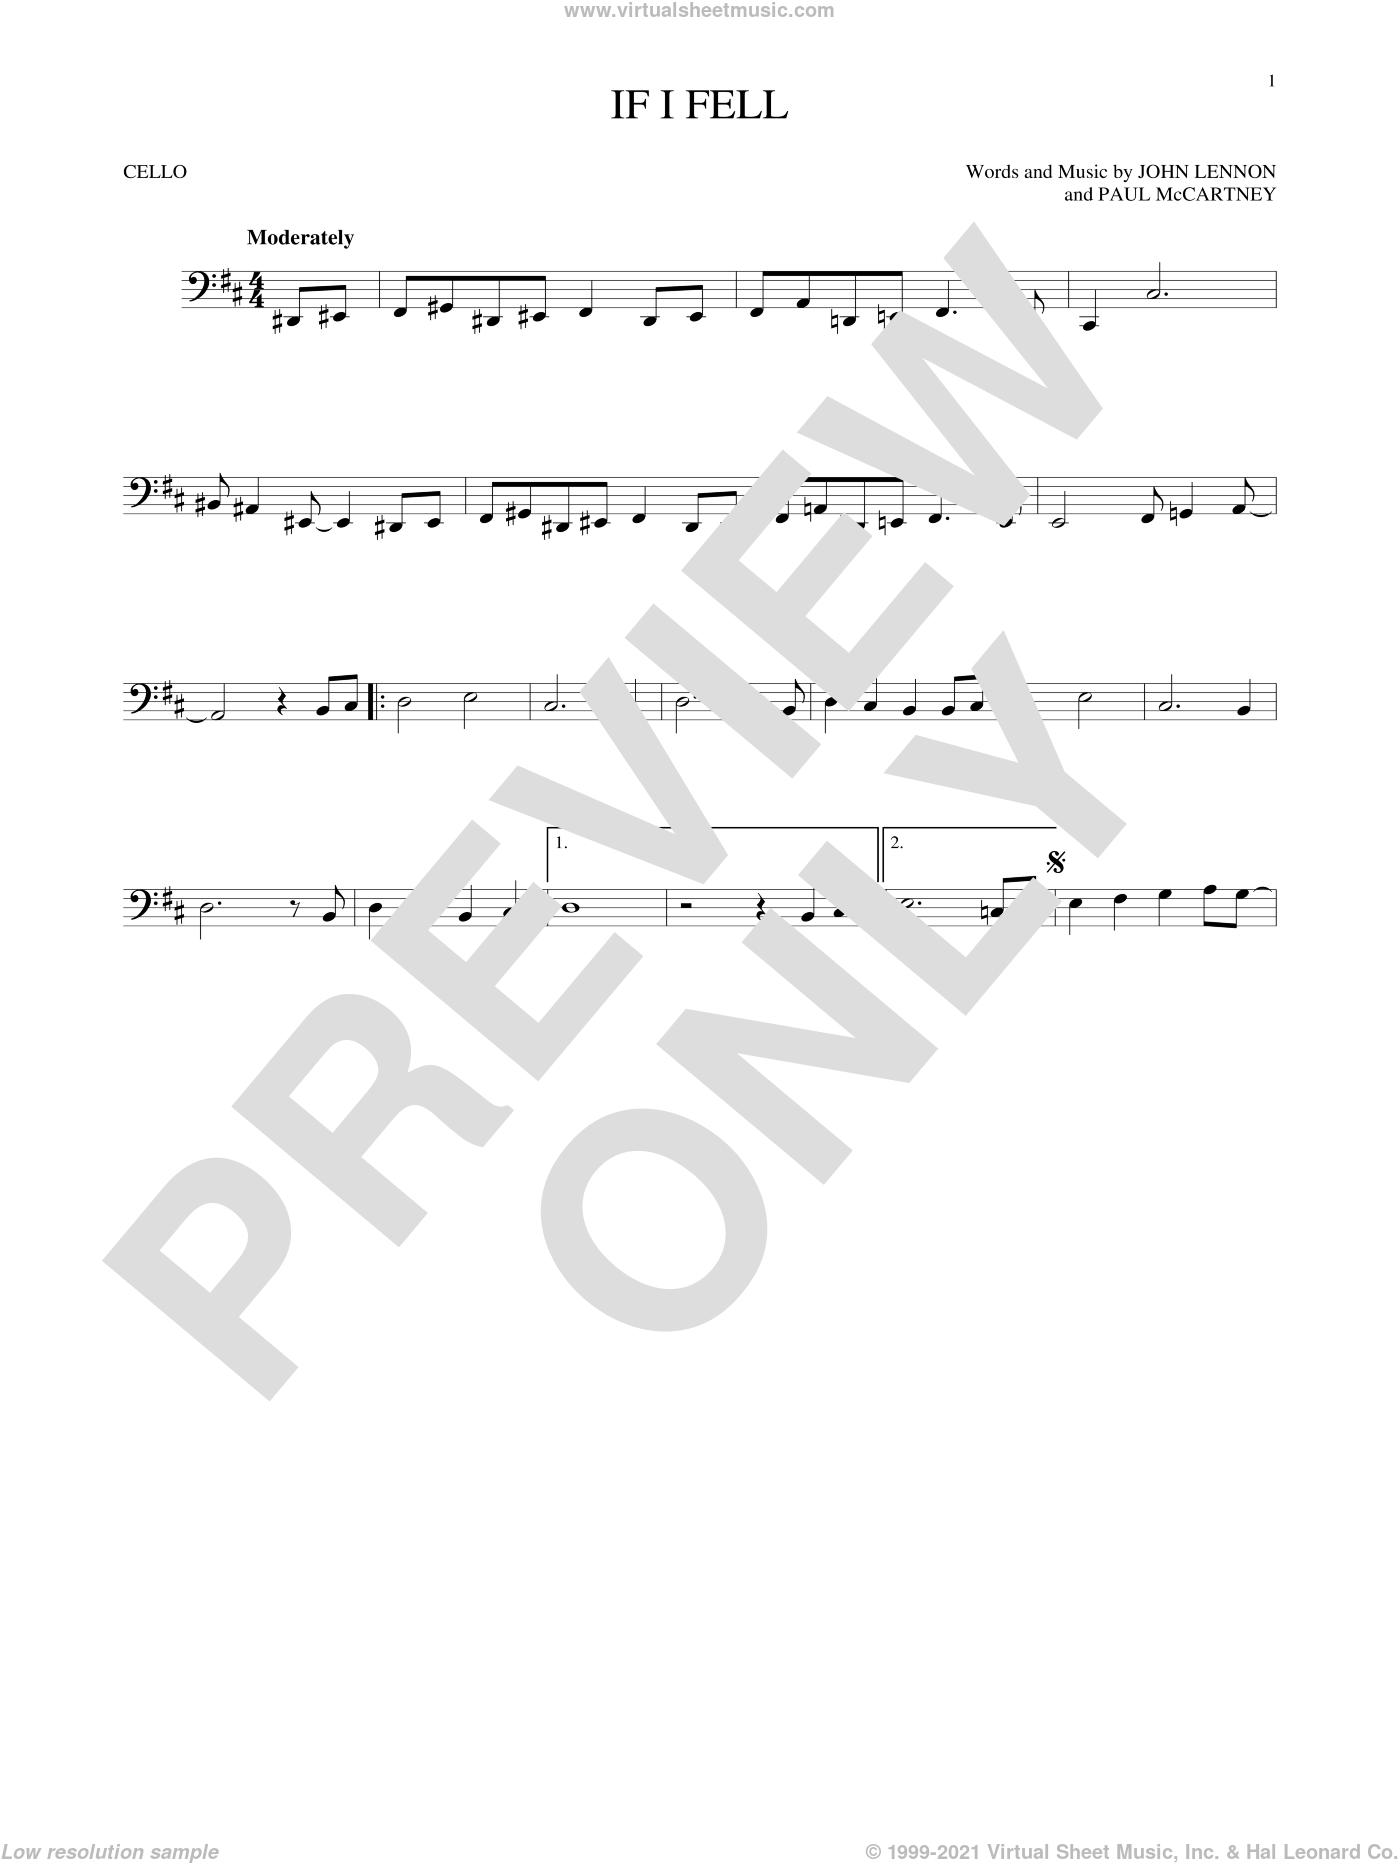 If I Fell sheet music for cello solo by The Beatles, John Lennon and Paul McCartney, intermediate skill level